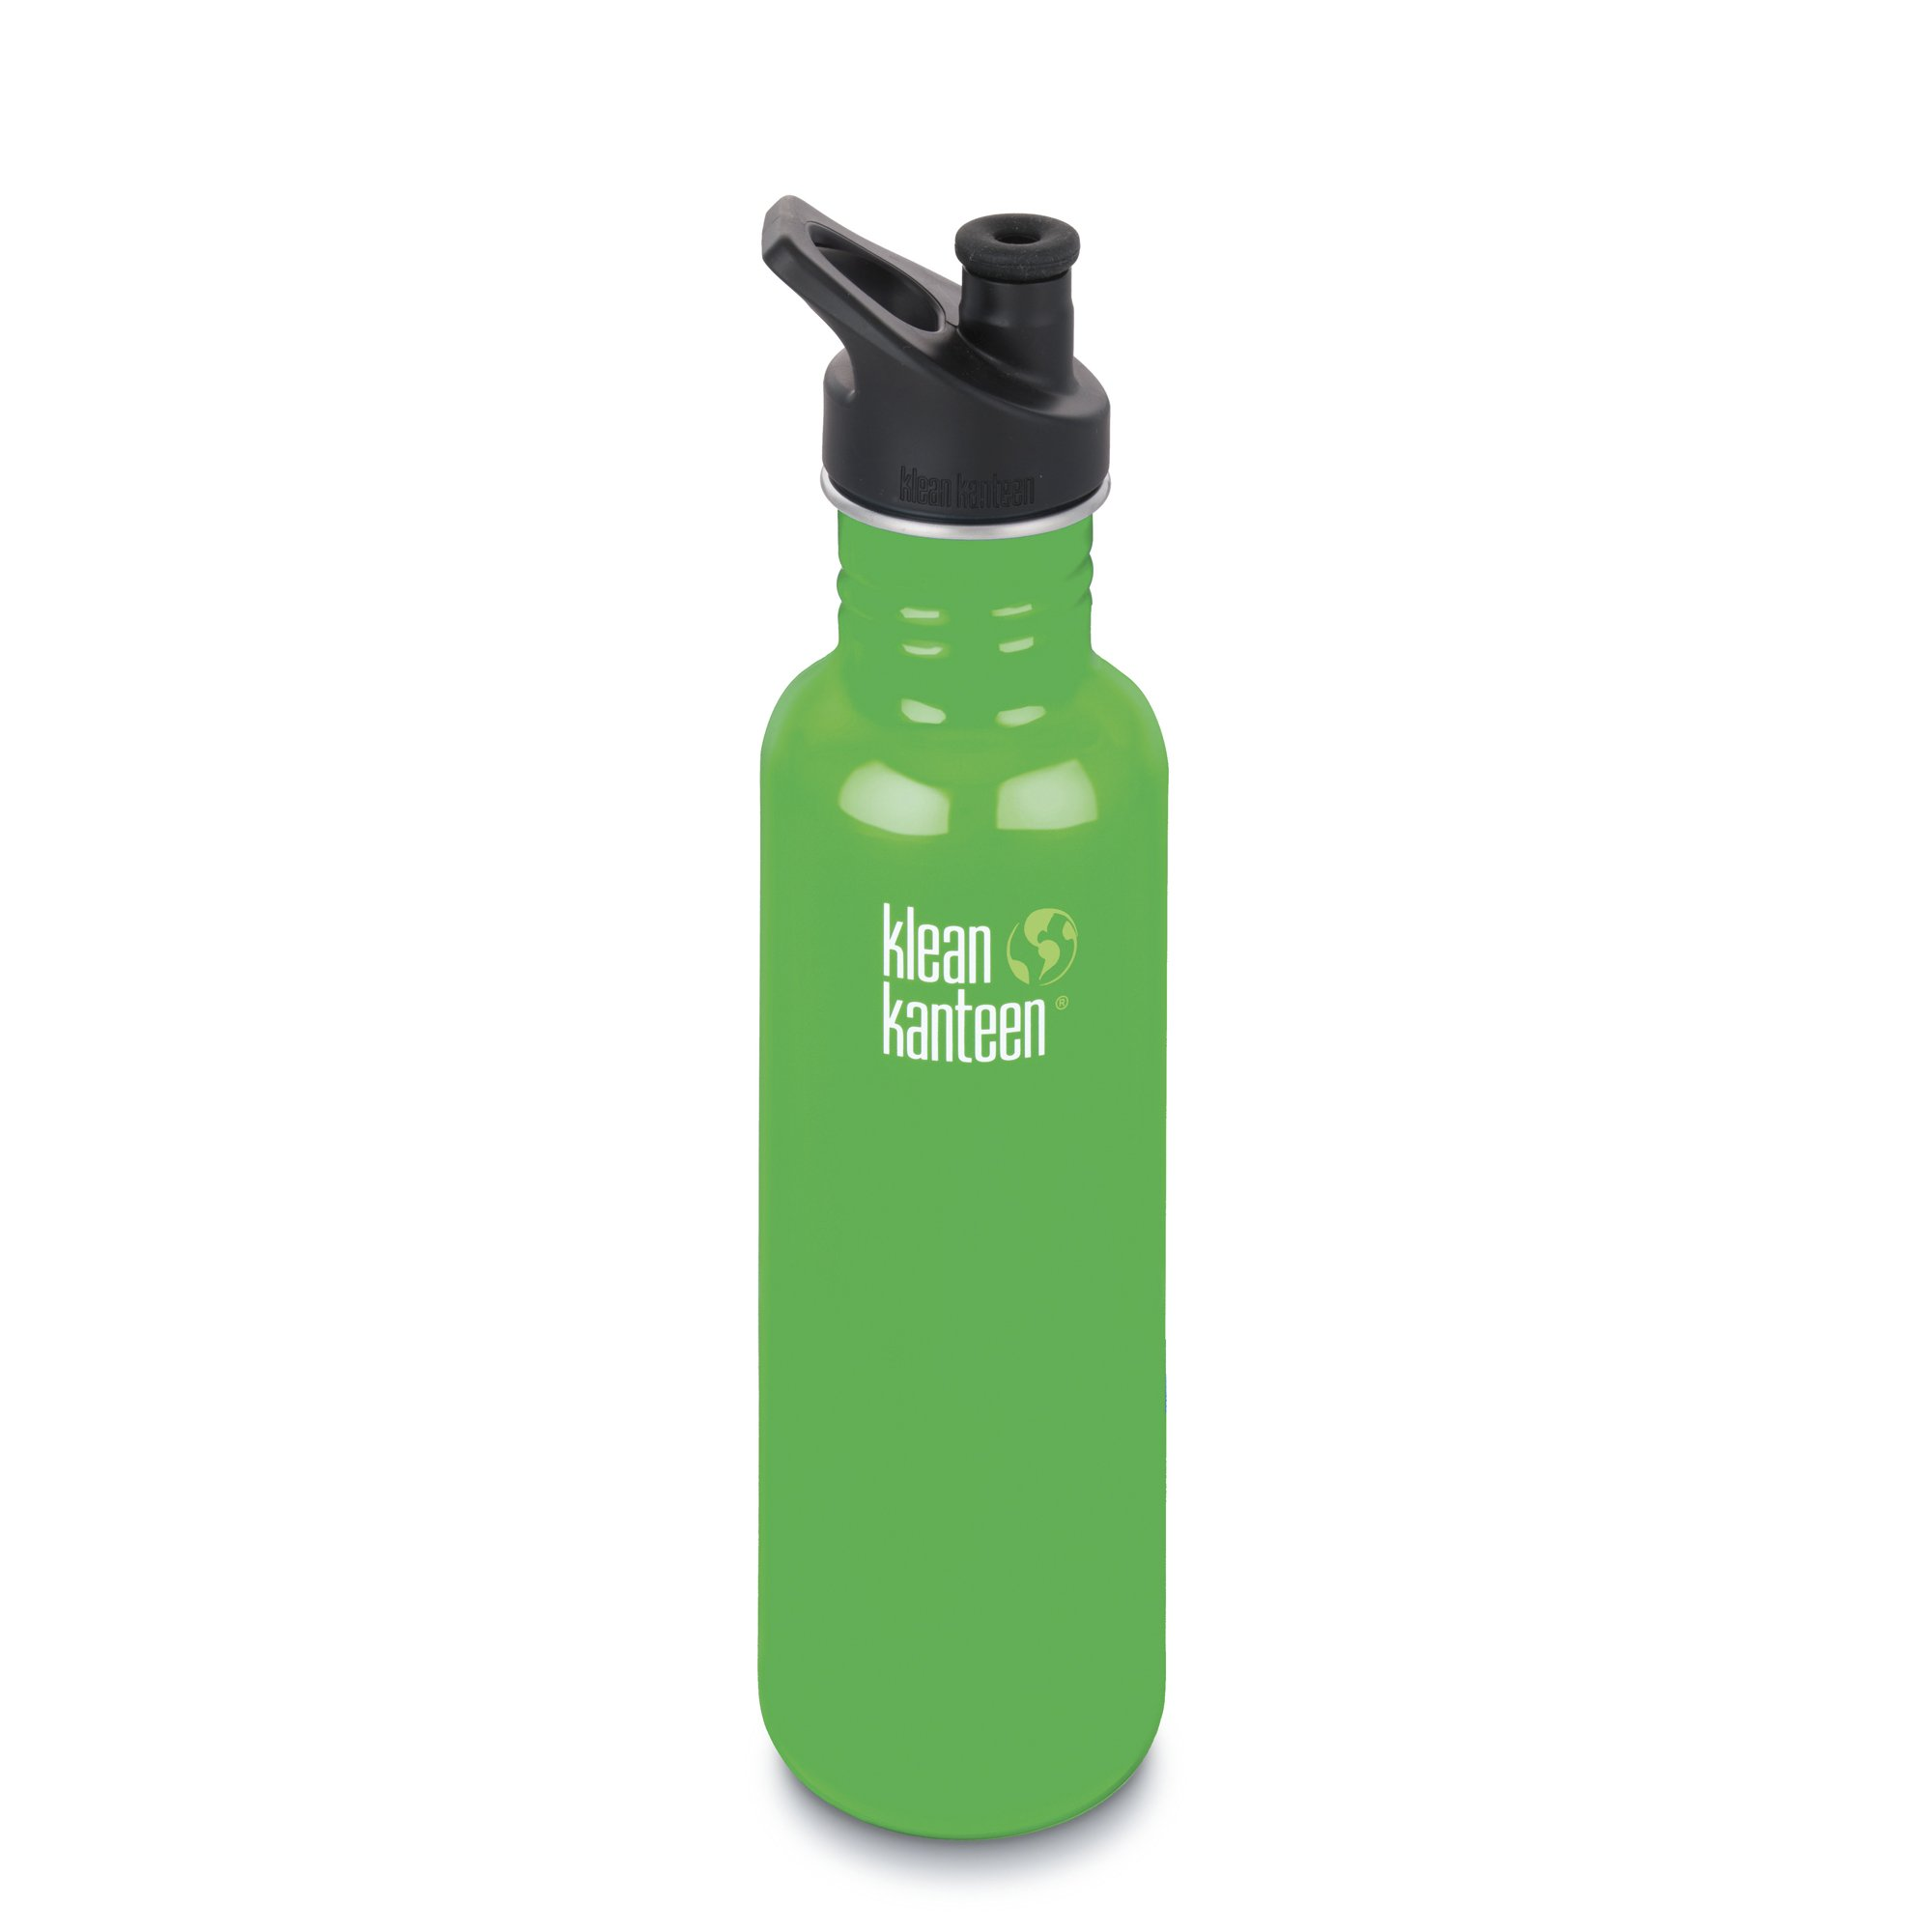 Klean Kanteen Classic Stainless Steel Bottle with Sport Cap, Organic Garden - 27oz